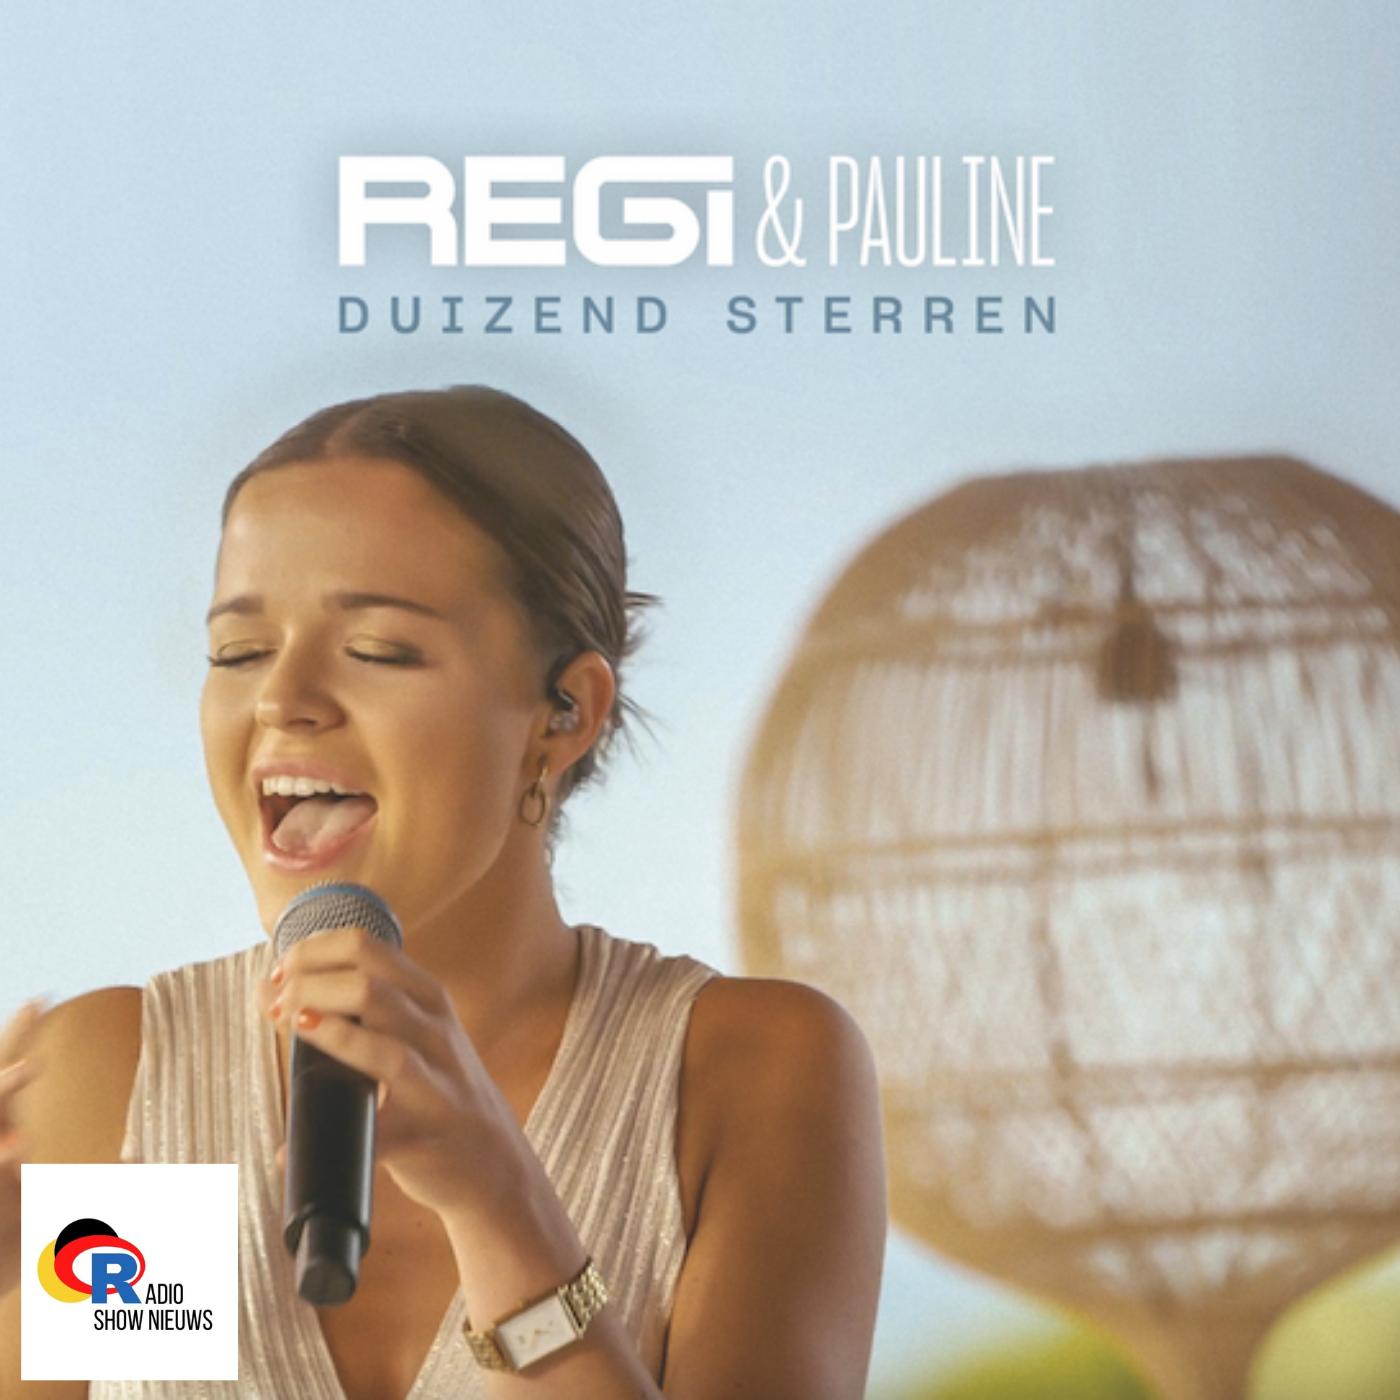 Régi & Pauline